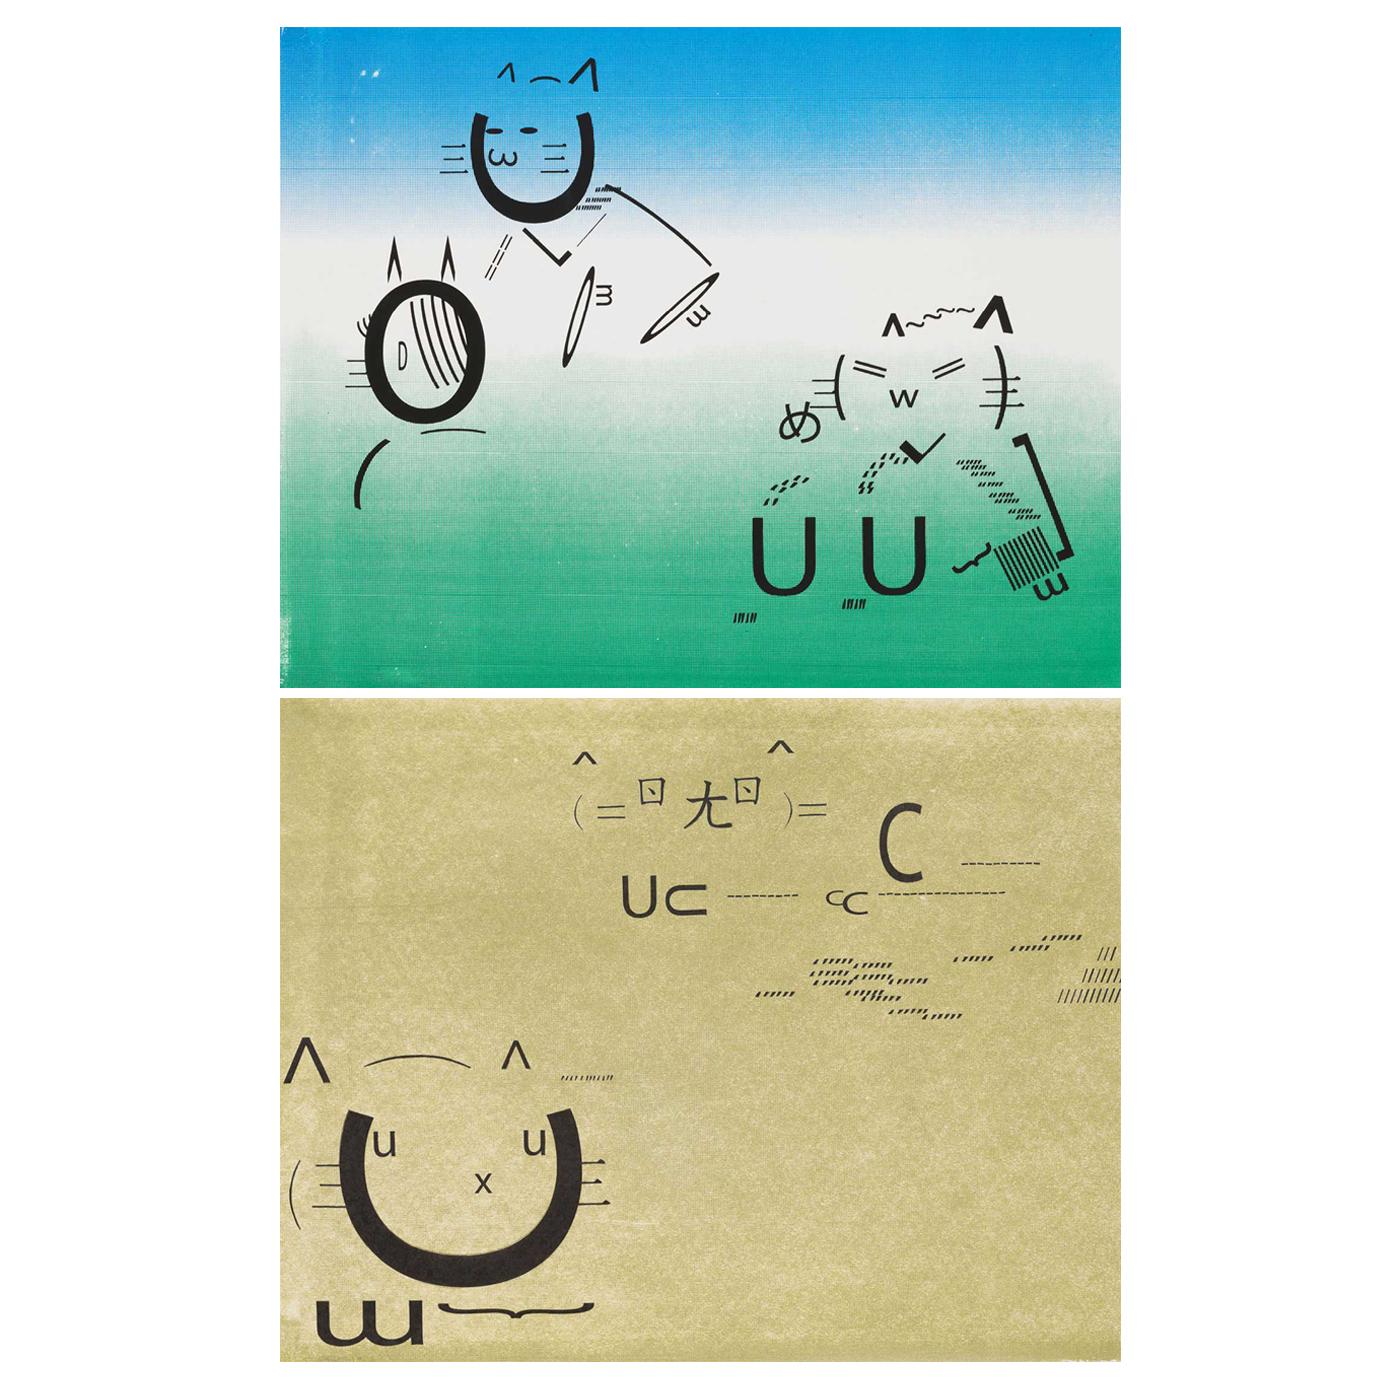 YuTung N. Hou - Cat Series—Hanami and Phaedra